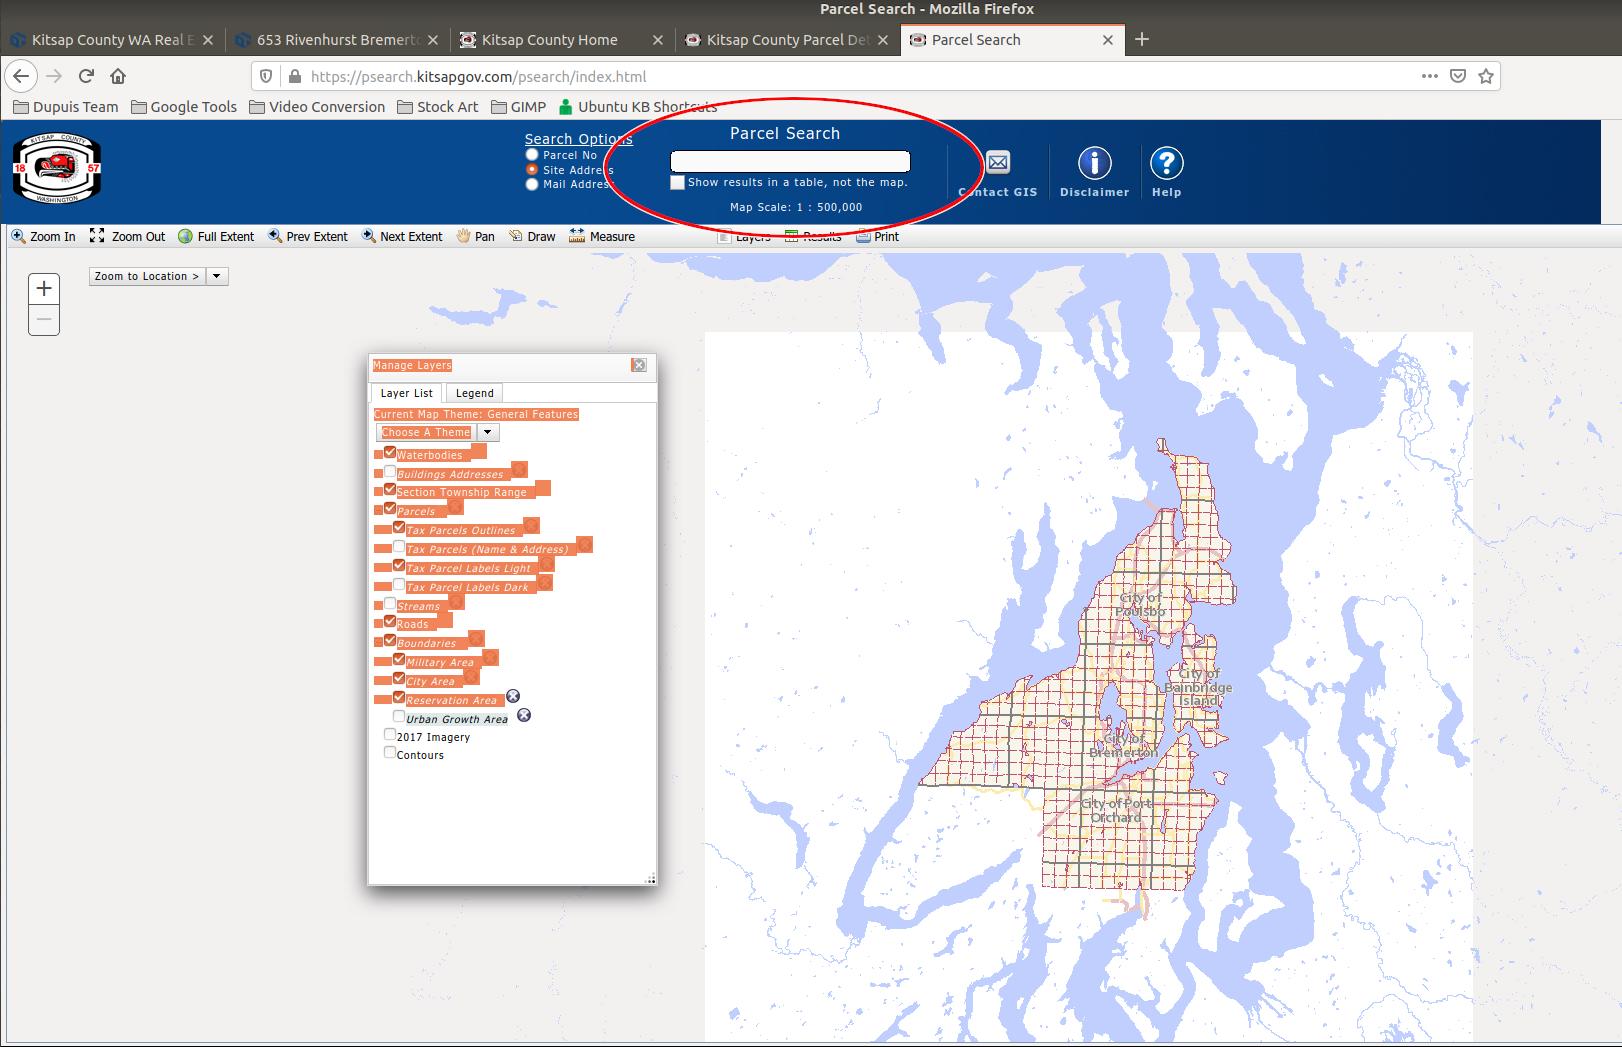 Kitsap County Map Based Parcel Search